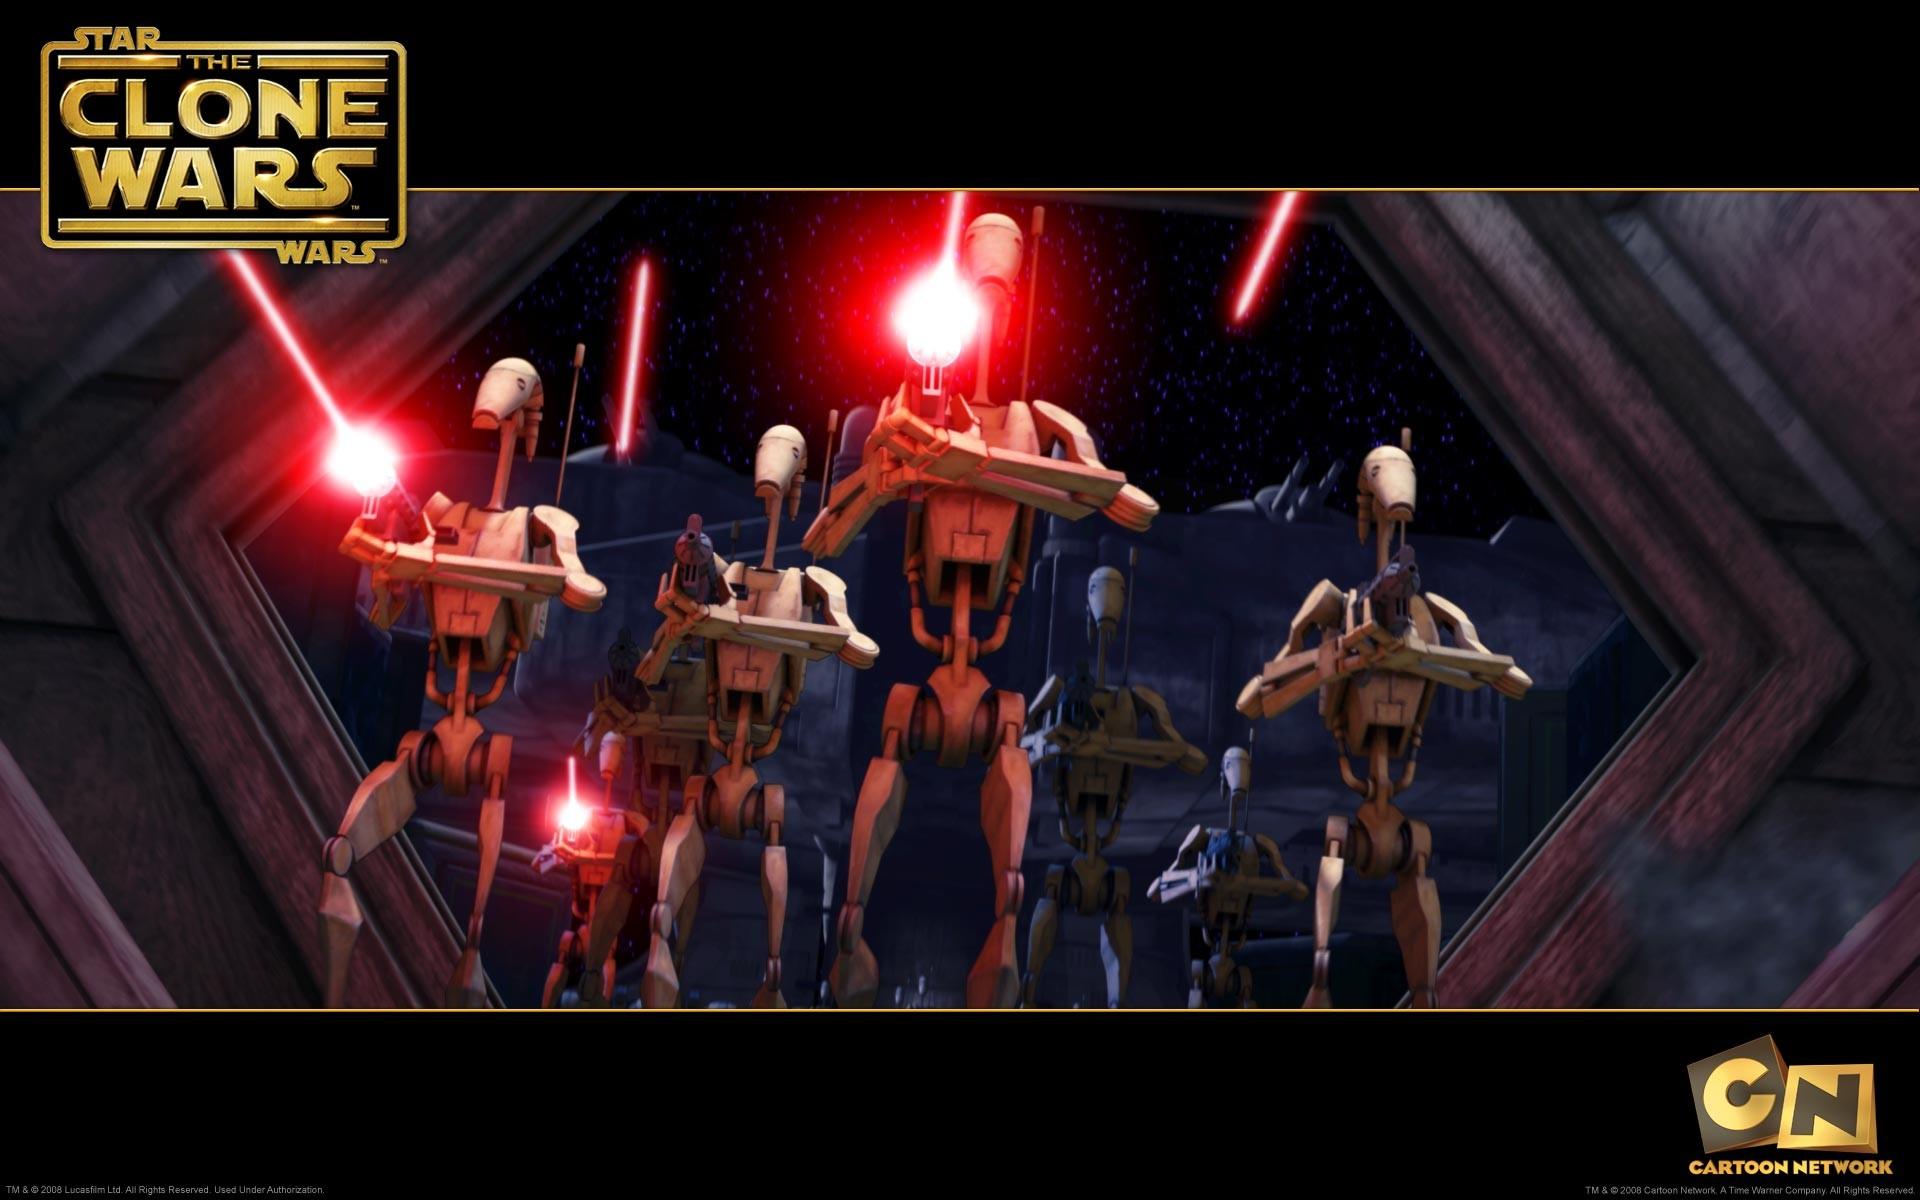 star wars, wallpaper, droids, battle, desktop, droid, click, clone